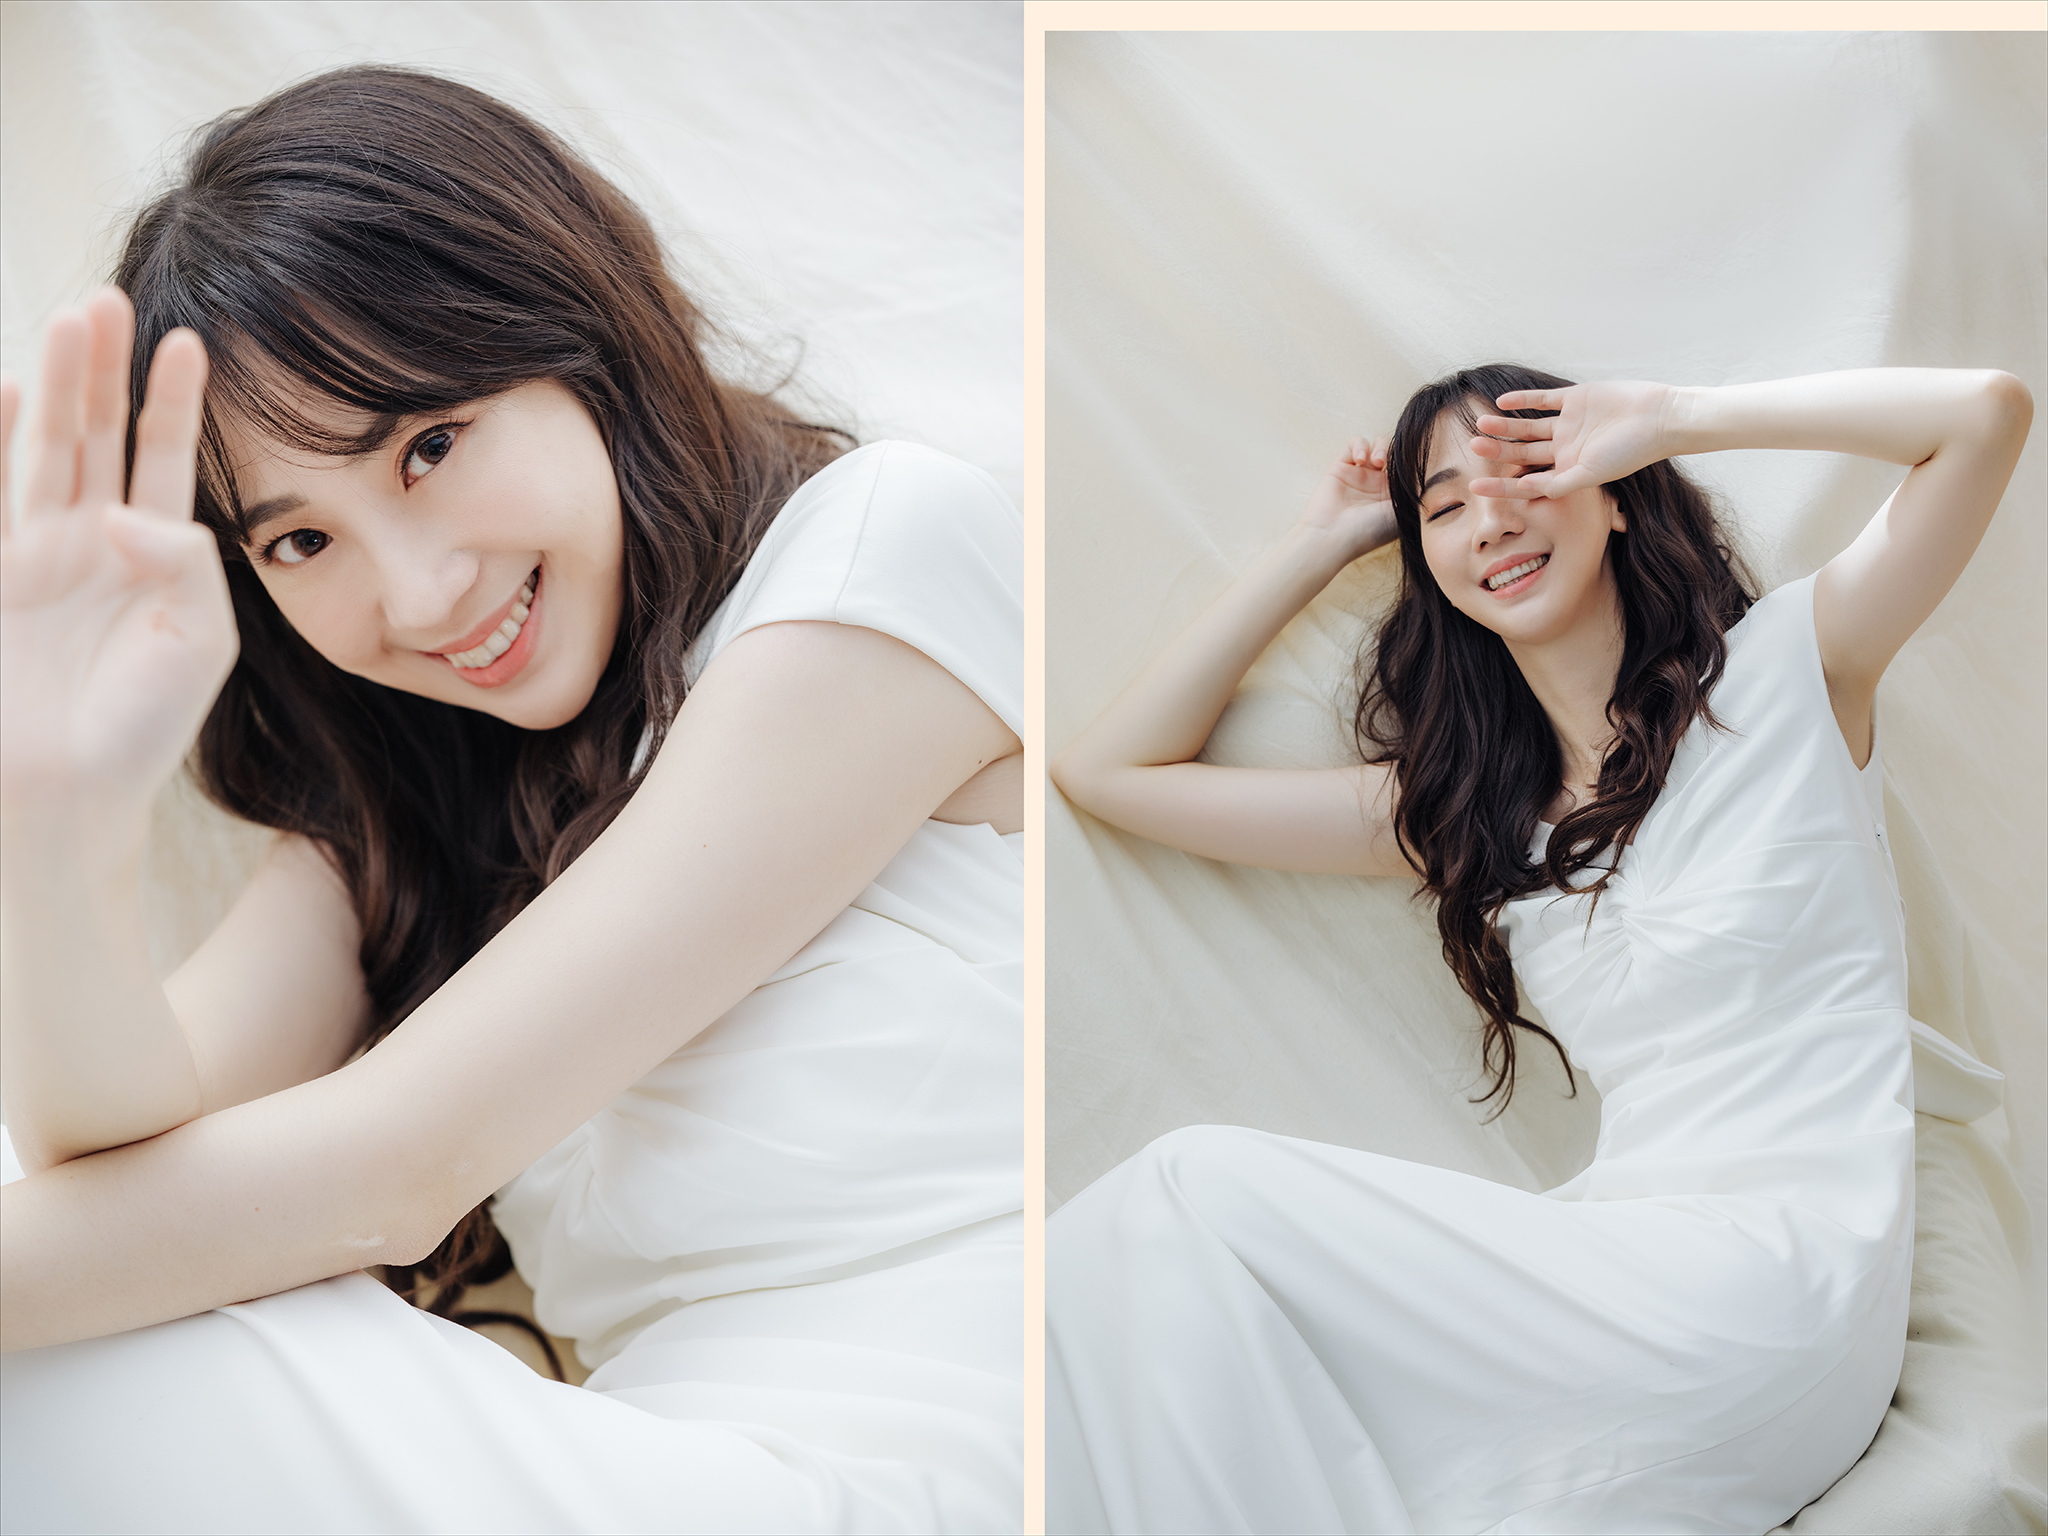 50660015586 b4ed9cd3d8 o - 【自主婚紗】+Melody+